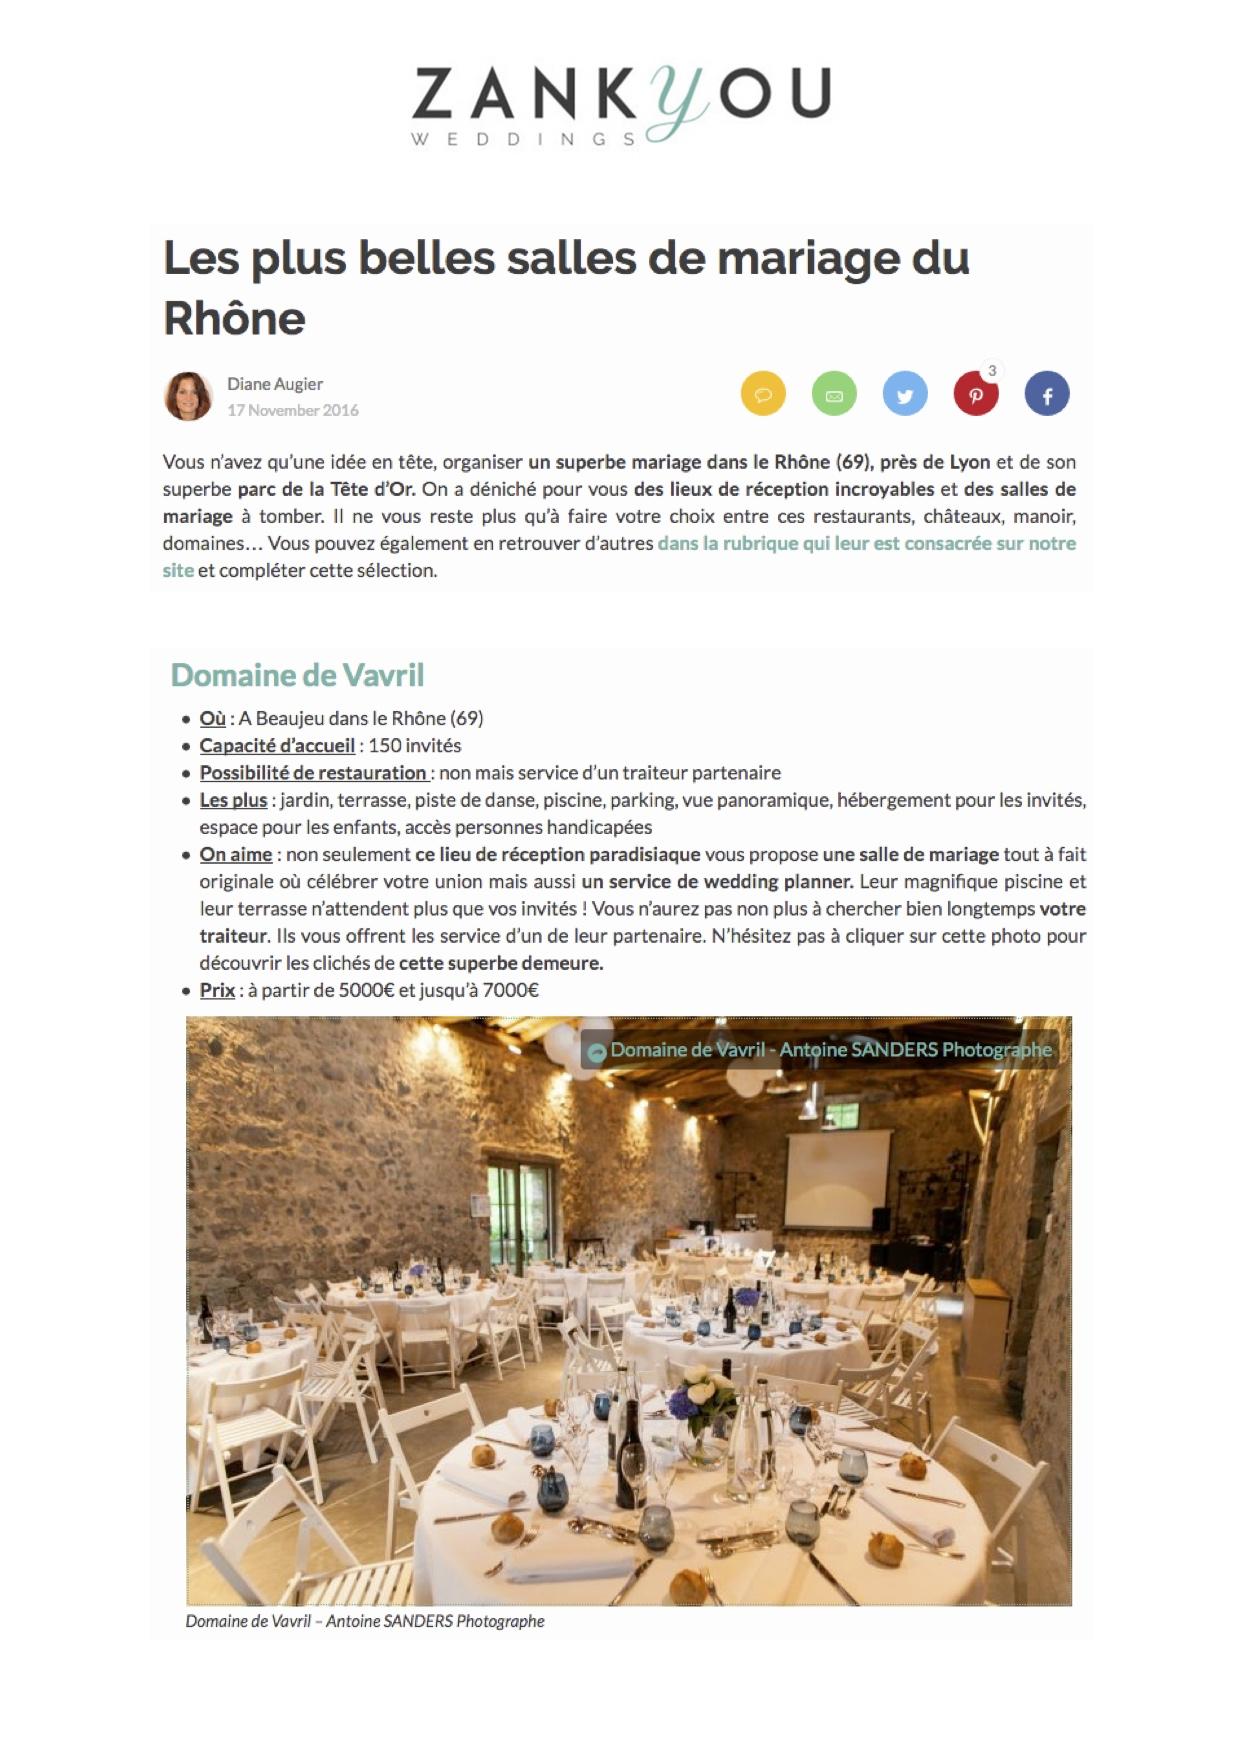 ZankYou Weddings - Les plus belles salles de mariage du Rhône - Novembre 2016